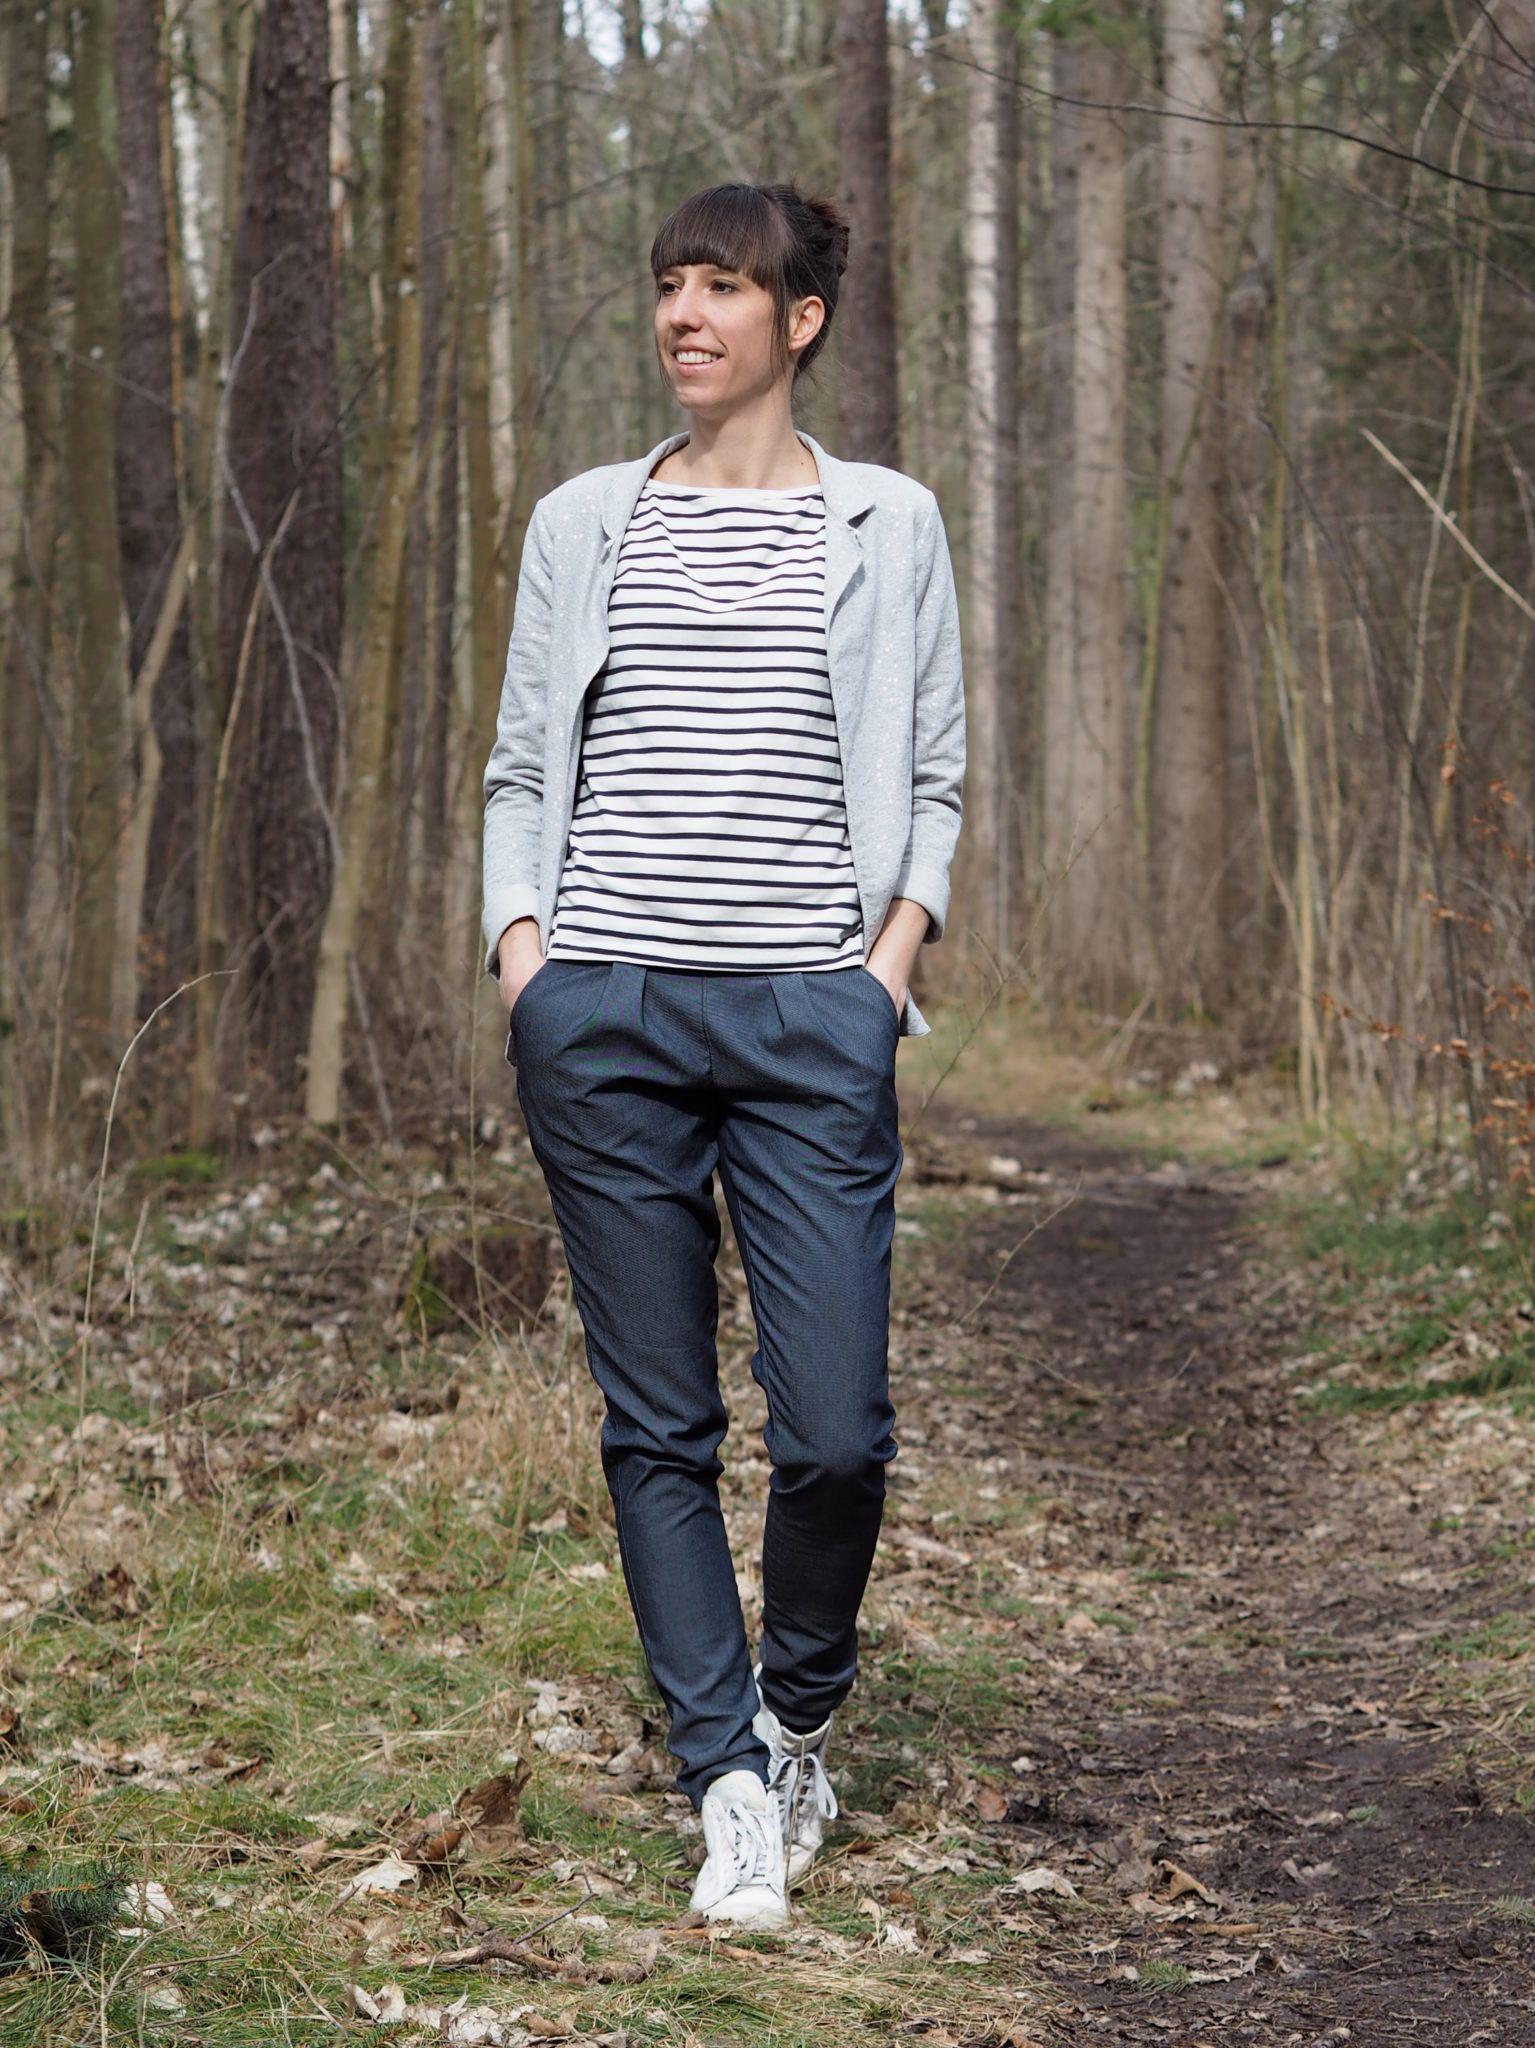 meistverkauft Vereinigte Staaten zarte Farben Schnittmuster nähen Jeans Hose COS Evlis Needle 9 | Nähen ...